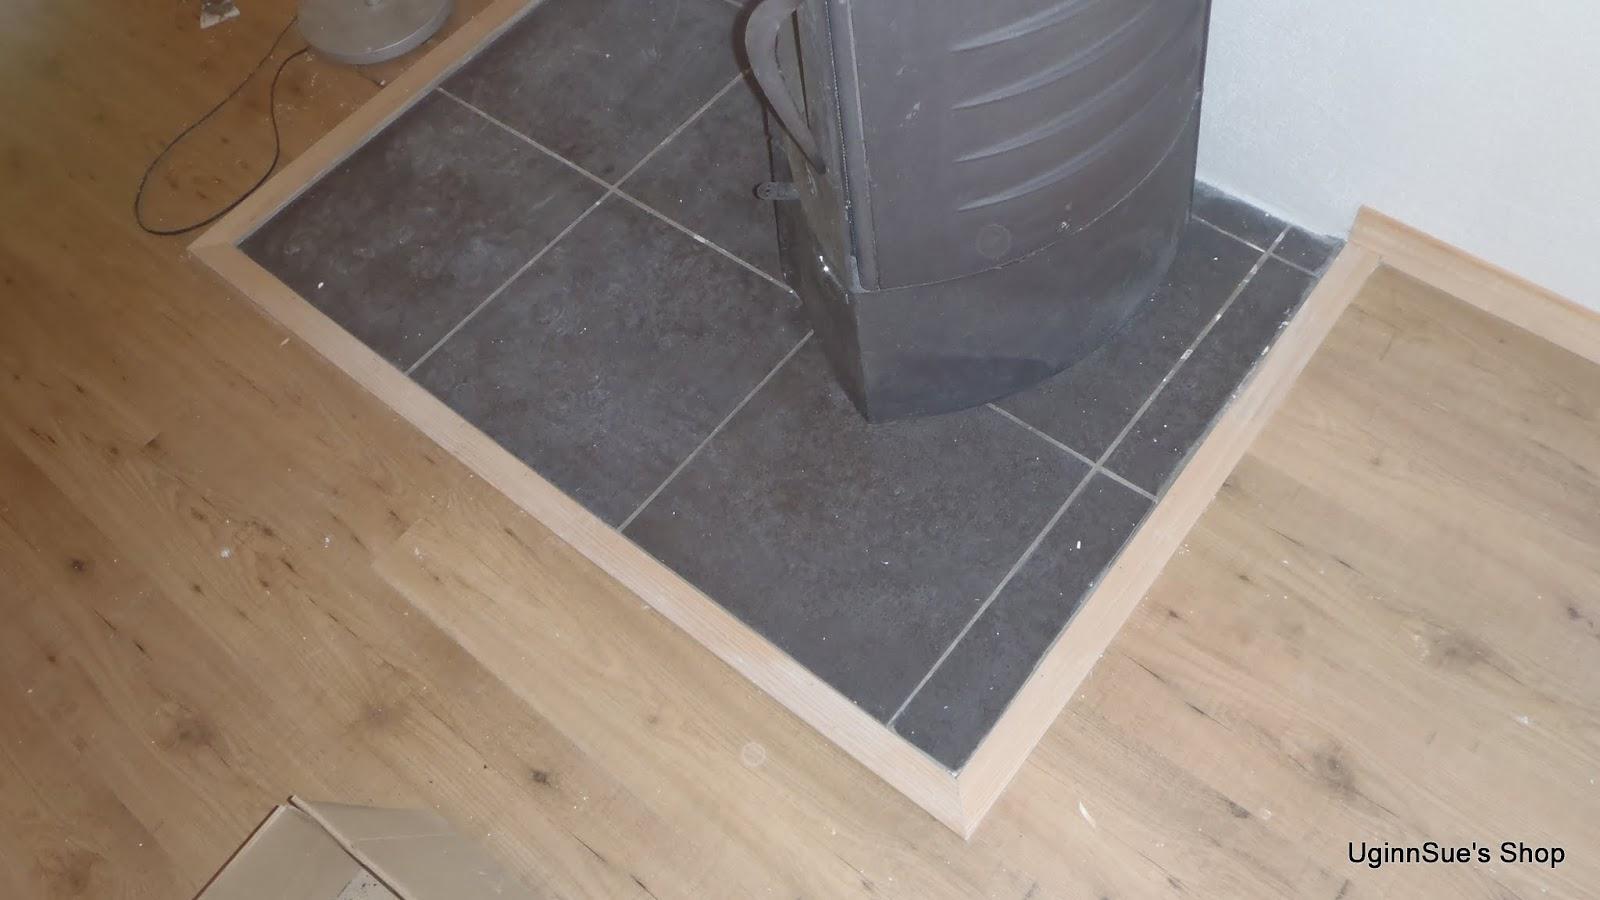 Laminate flooring will laminate flooring hold up kitchen for Kitchen laminate flooring